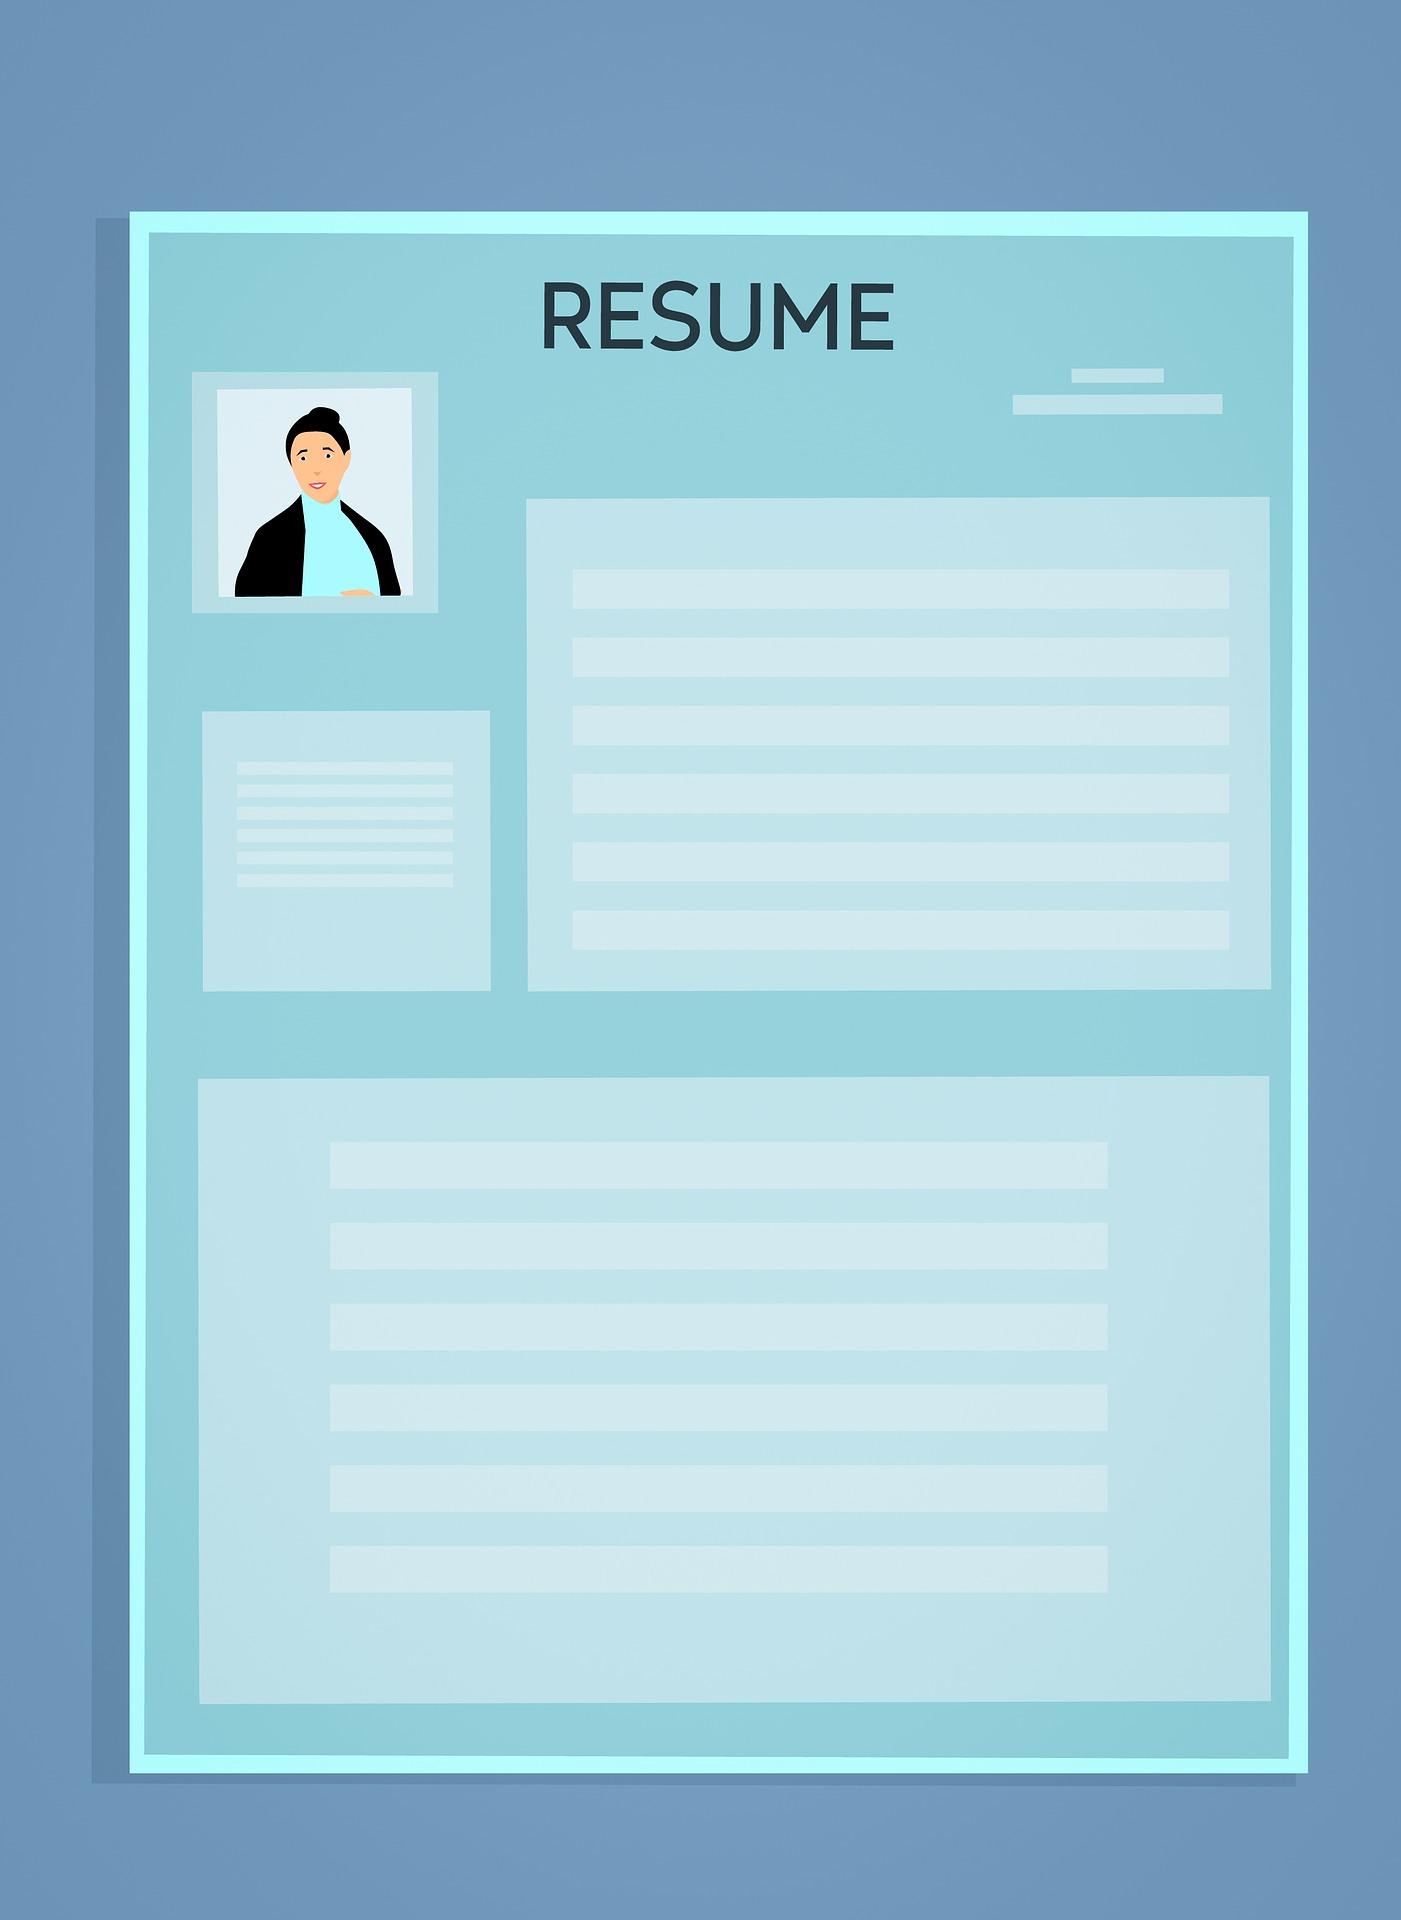 resume-3604240_1920.jpg